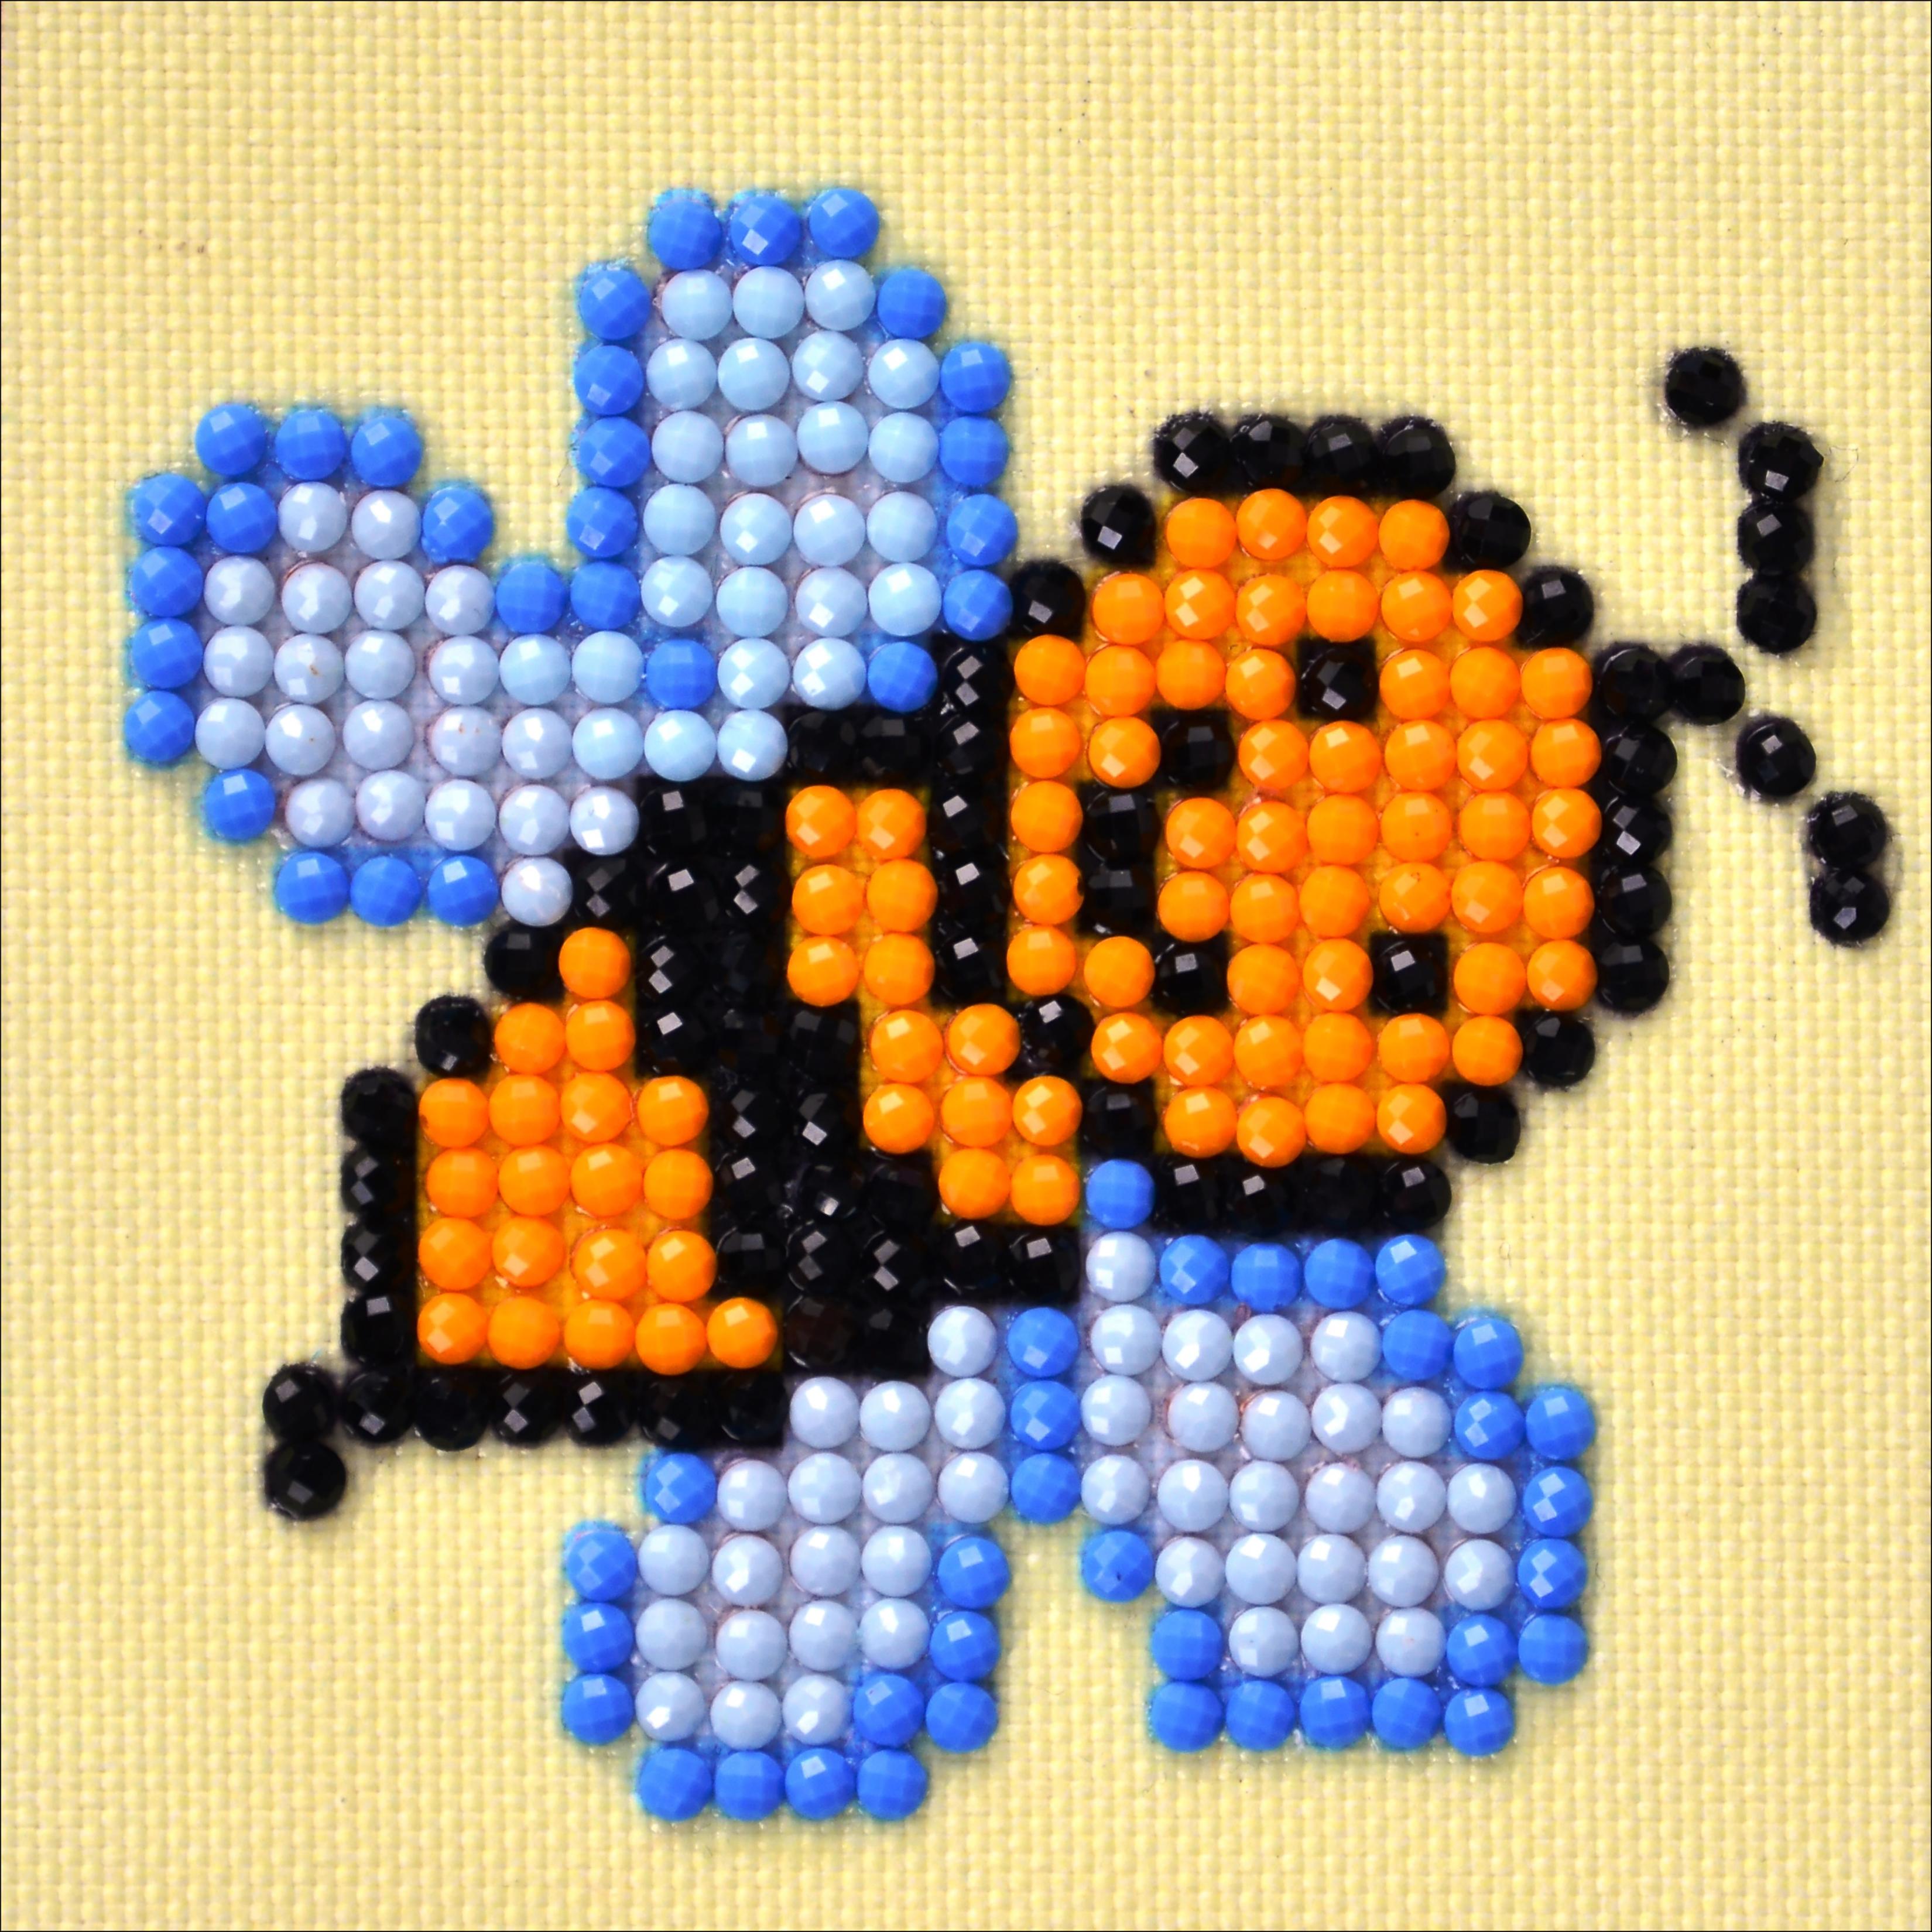 Diamond Dotz Diamond Embroidery Facet Art Kit 4.75X4.75-Busy Buzzz